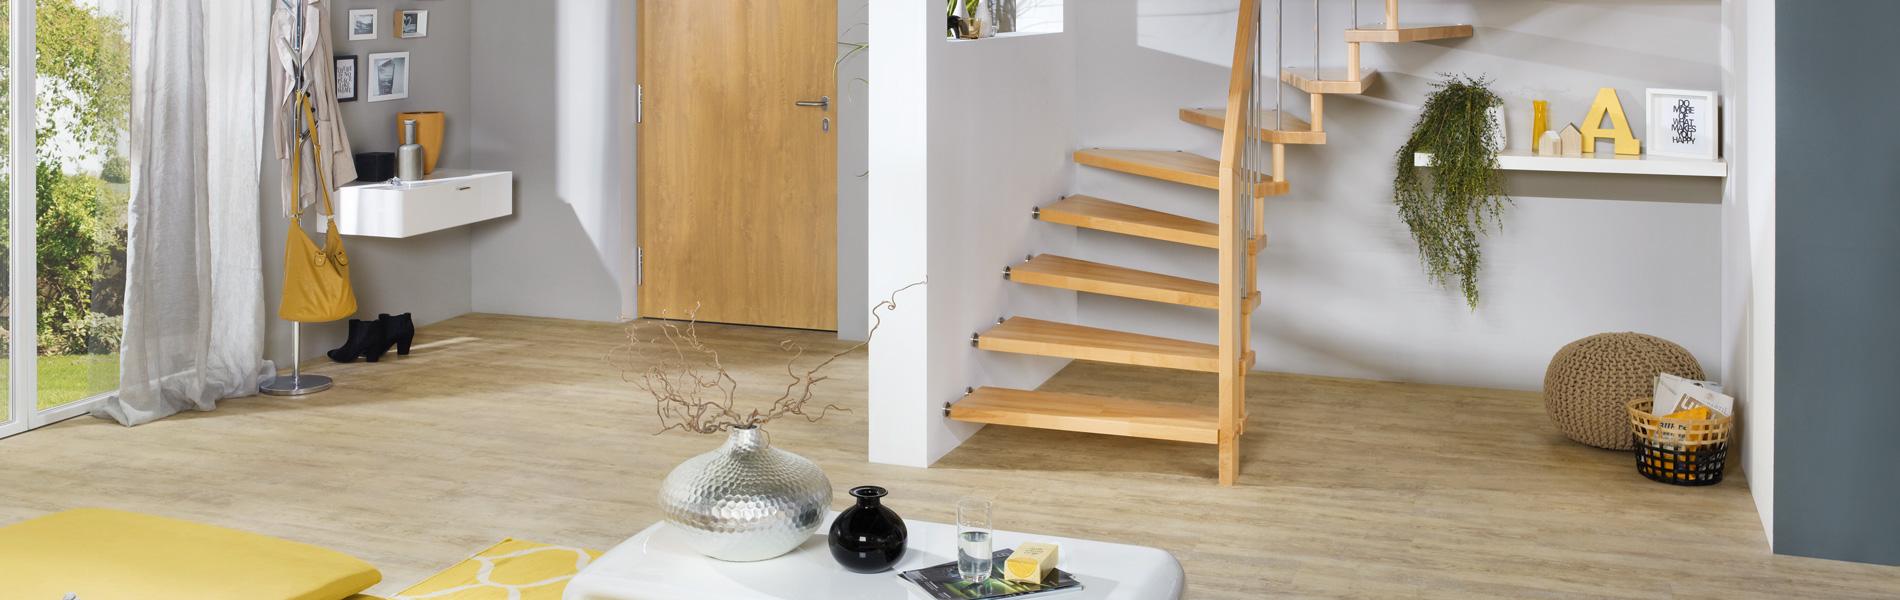 Bucher Treppen - Das Original